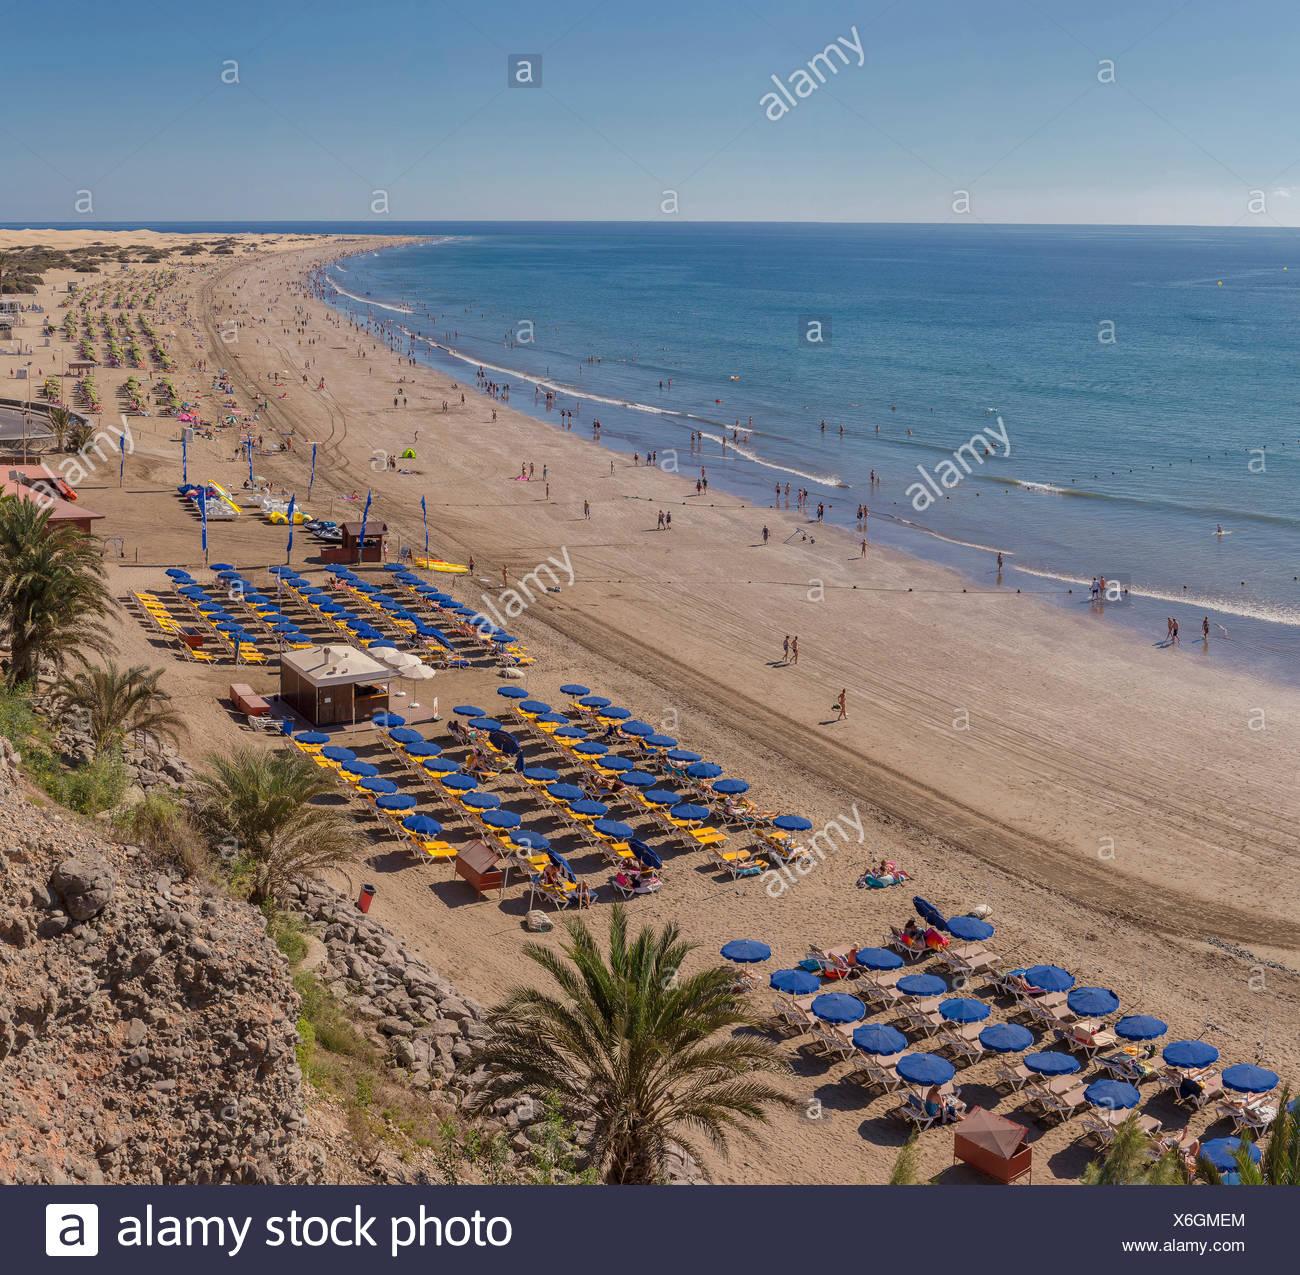 Spanien, Europa, Playa del Ingles, Gran Canaria, Kanaren, Playa de Las Burras, Sommer, Strand, Meer, Menschen, Landschaft, sunsh Stockbild